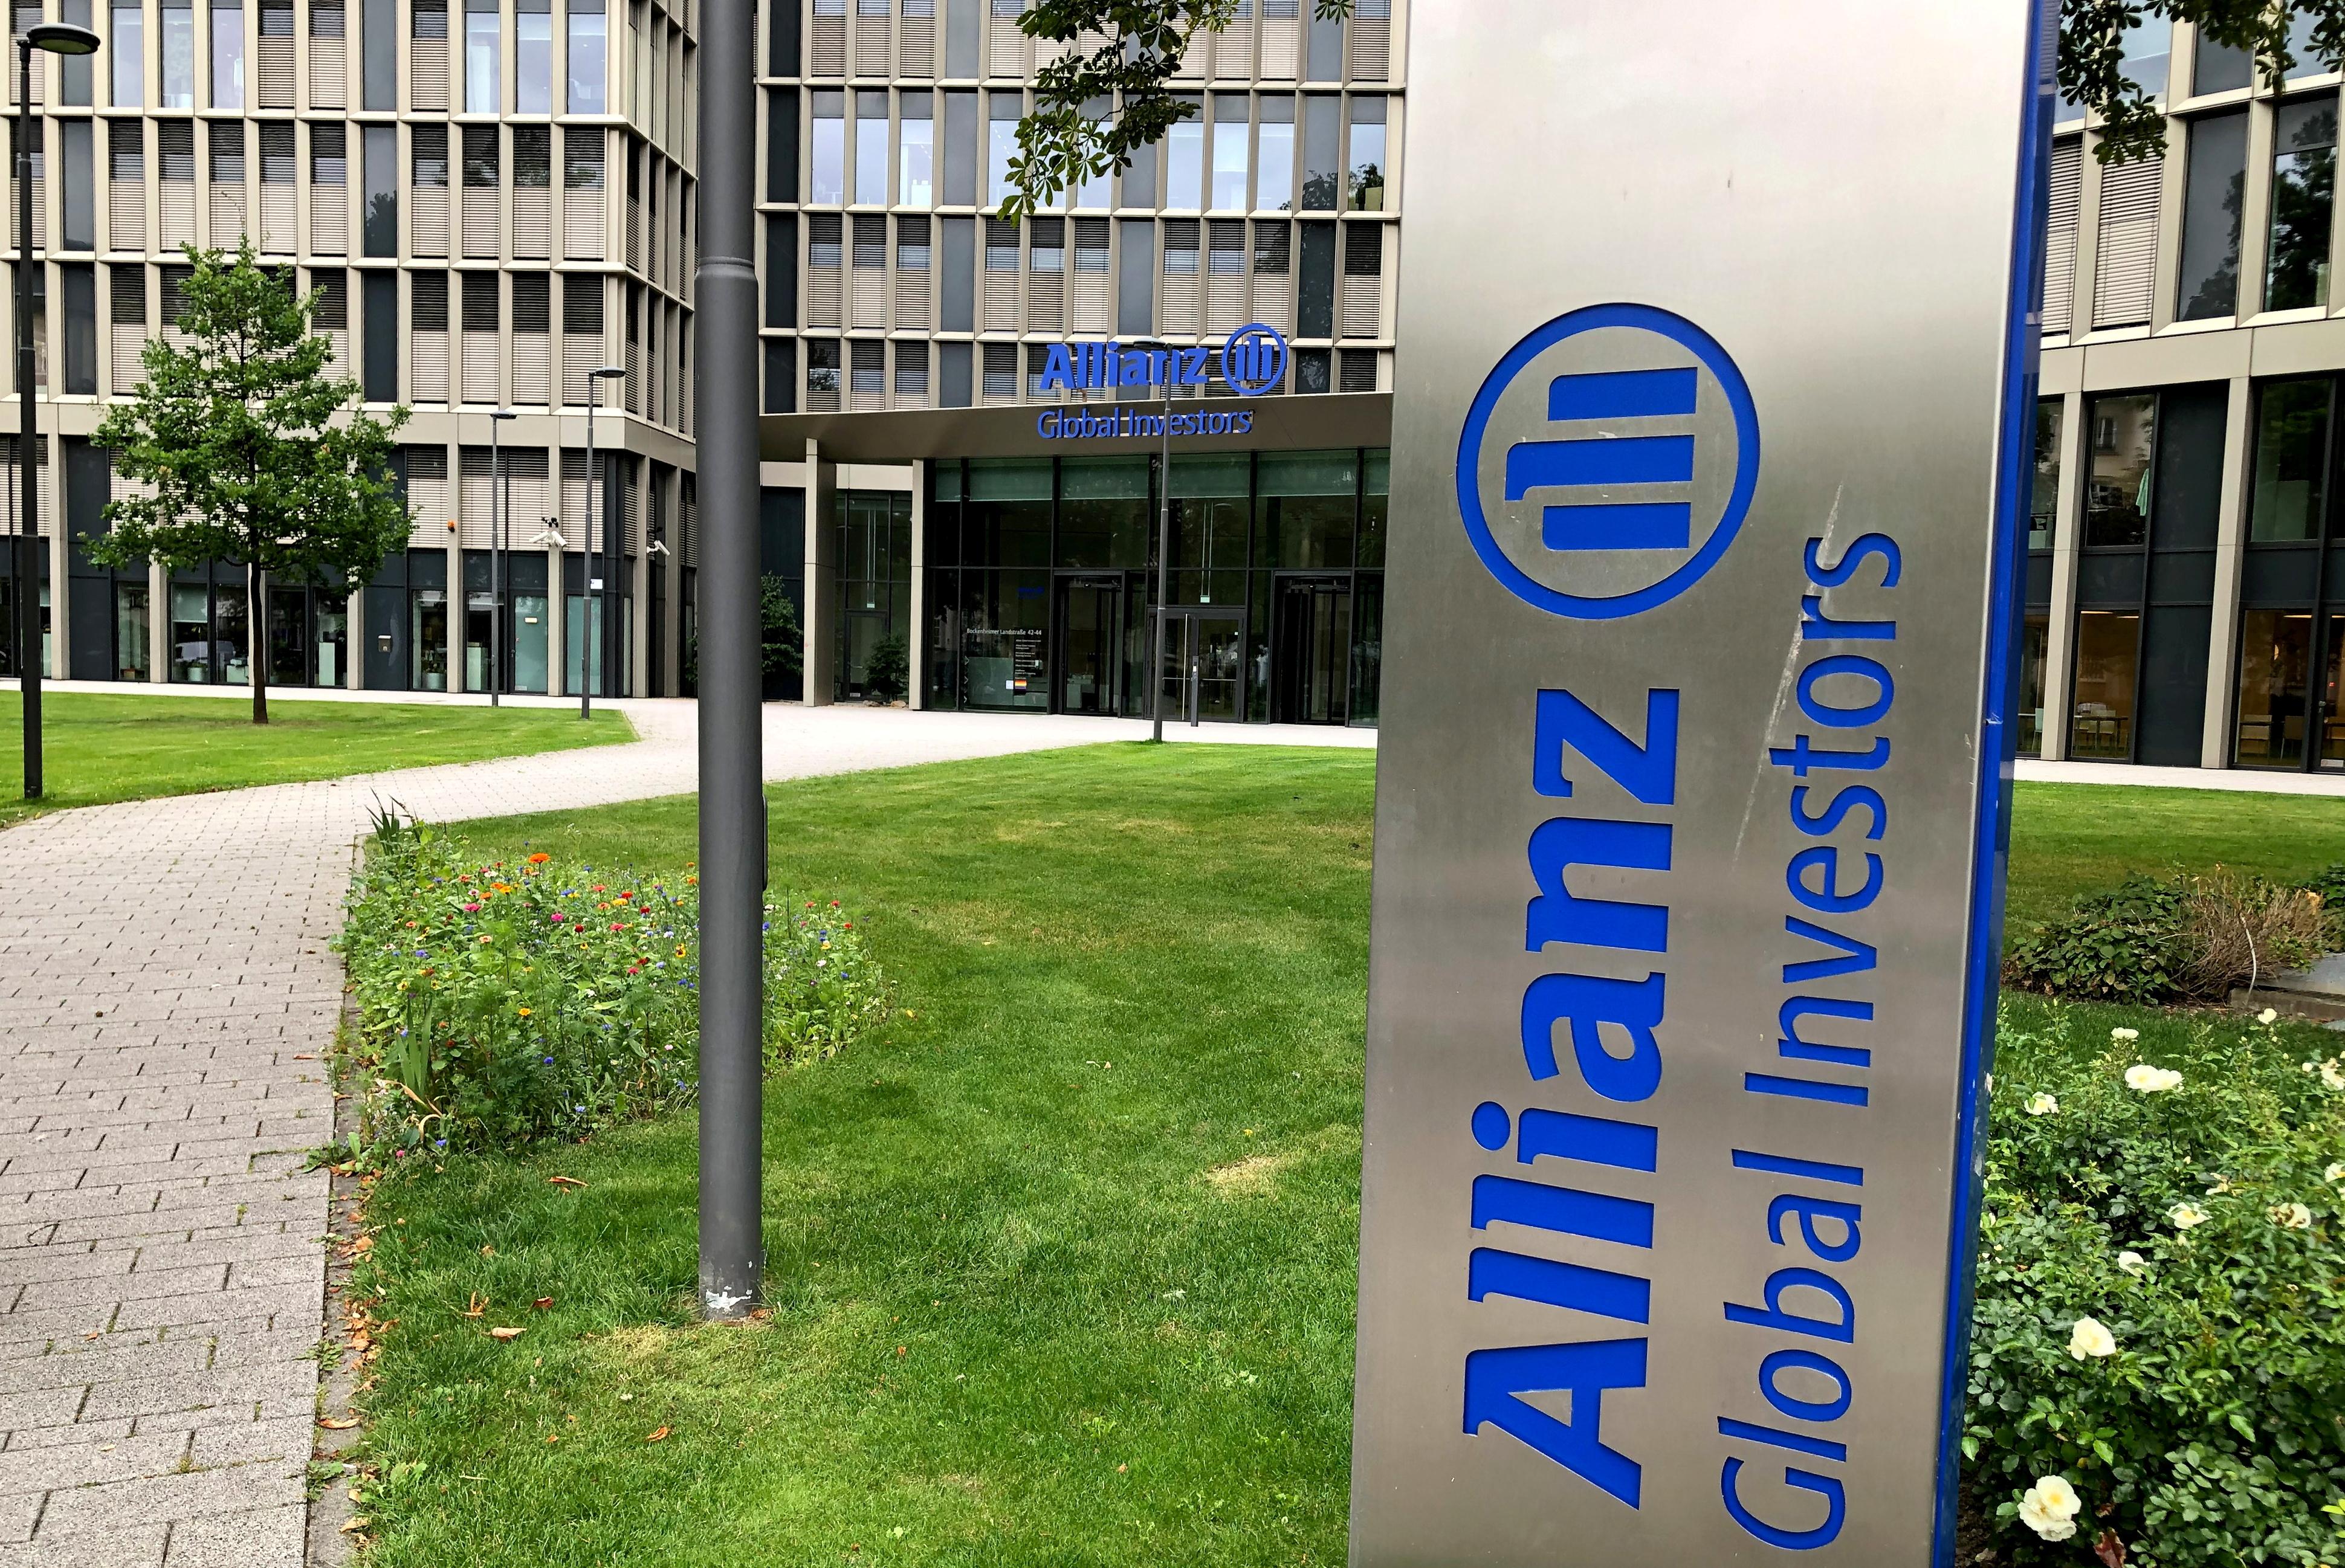 General view of the Allianz Global Investors headquarters in Frankfurt, Germany August 16, 2021. REUTERS/Tilman Blasshofer